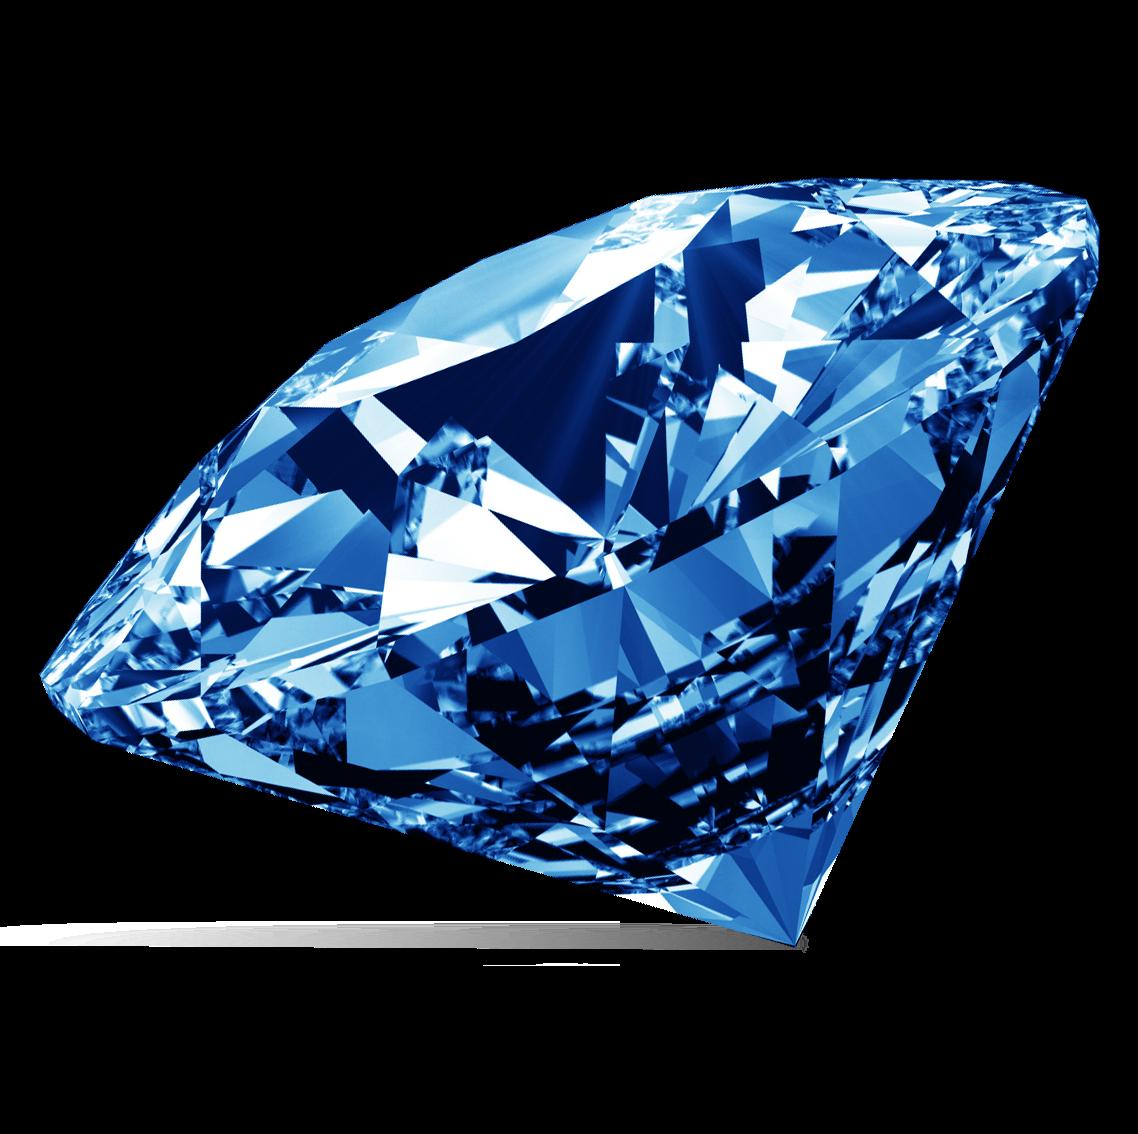 Blue are not as. Clipart diamond shiny diamond